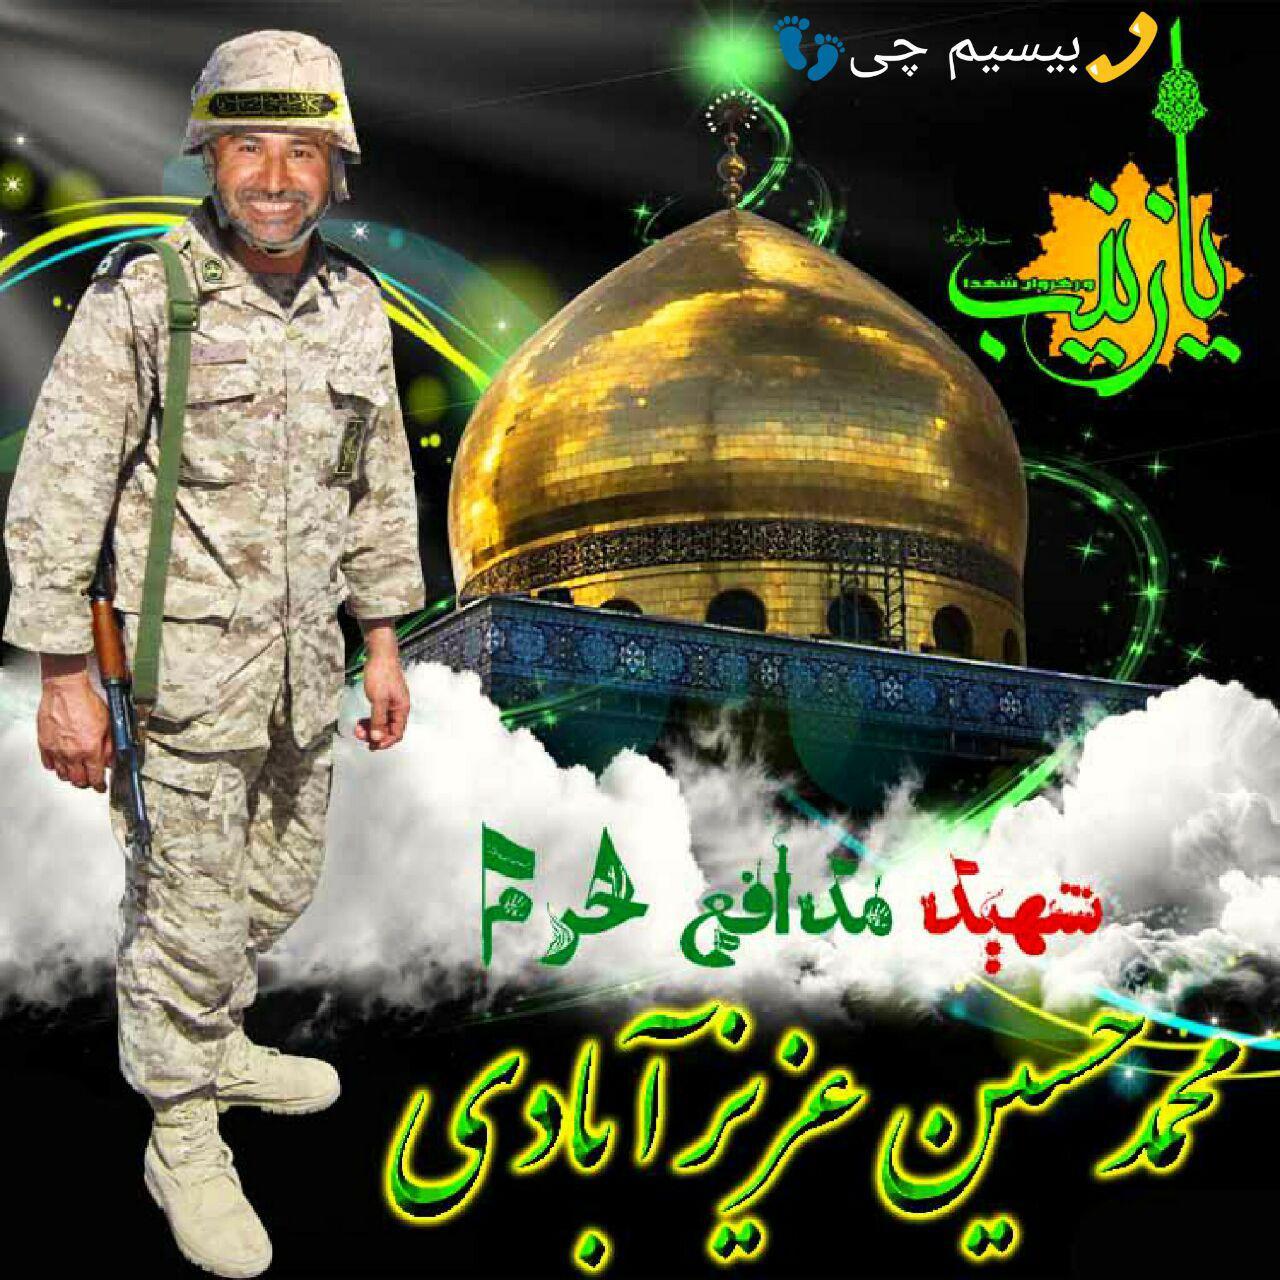 شهید محمد حسین عزیزآبادی مدافع حرم http://modafein-haram.blogsky.com